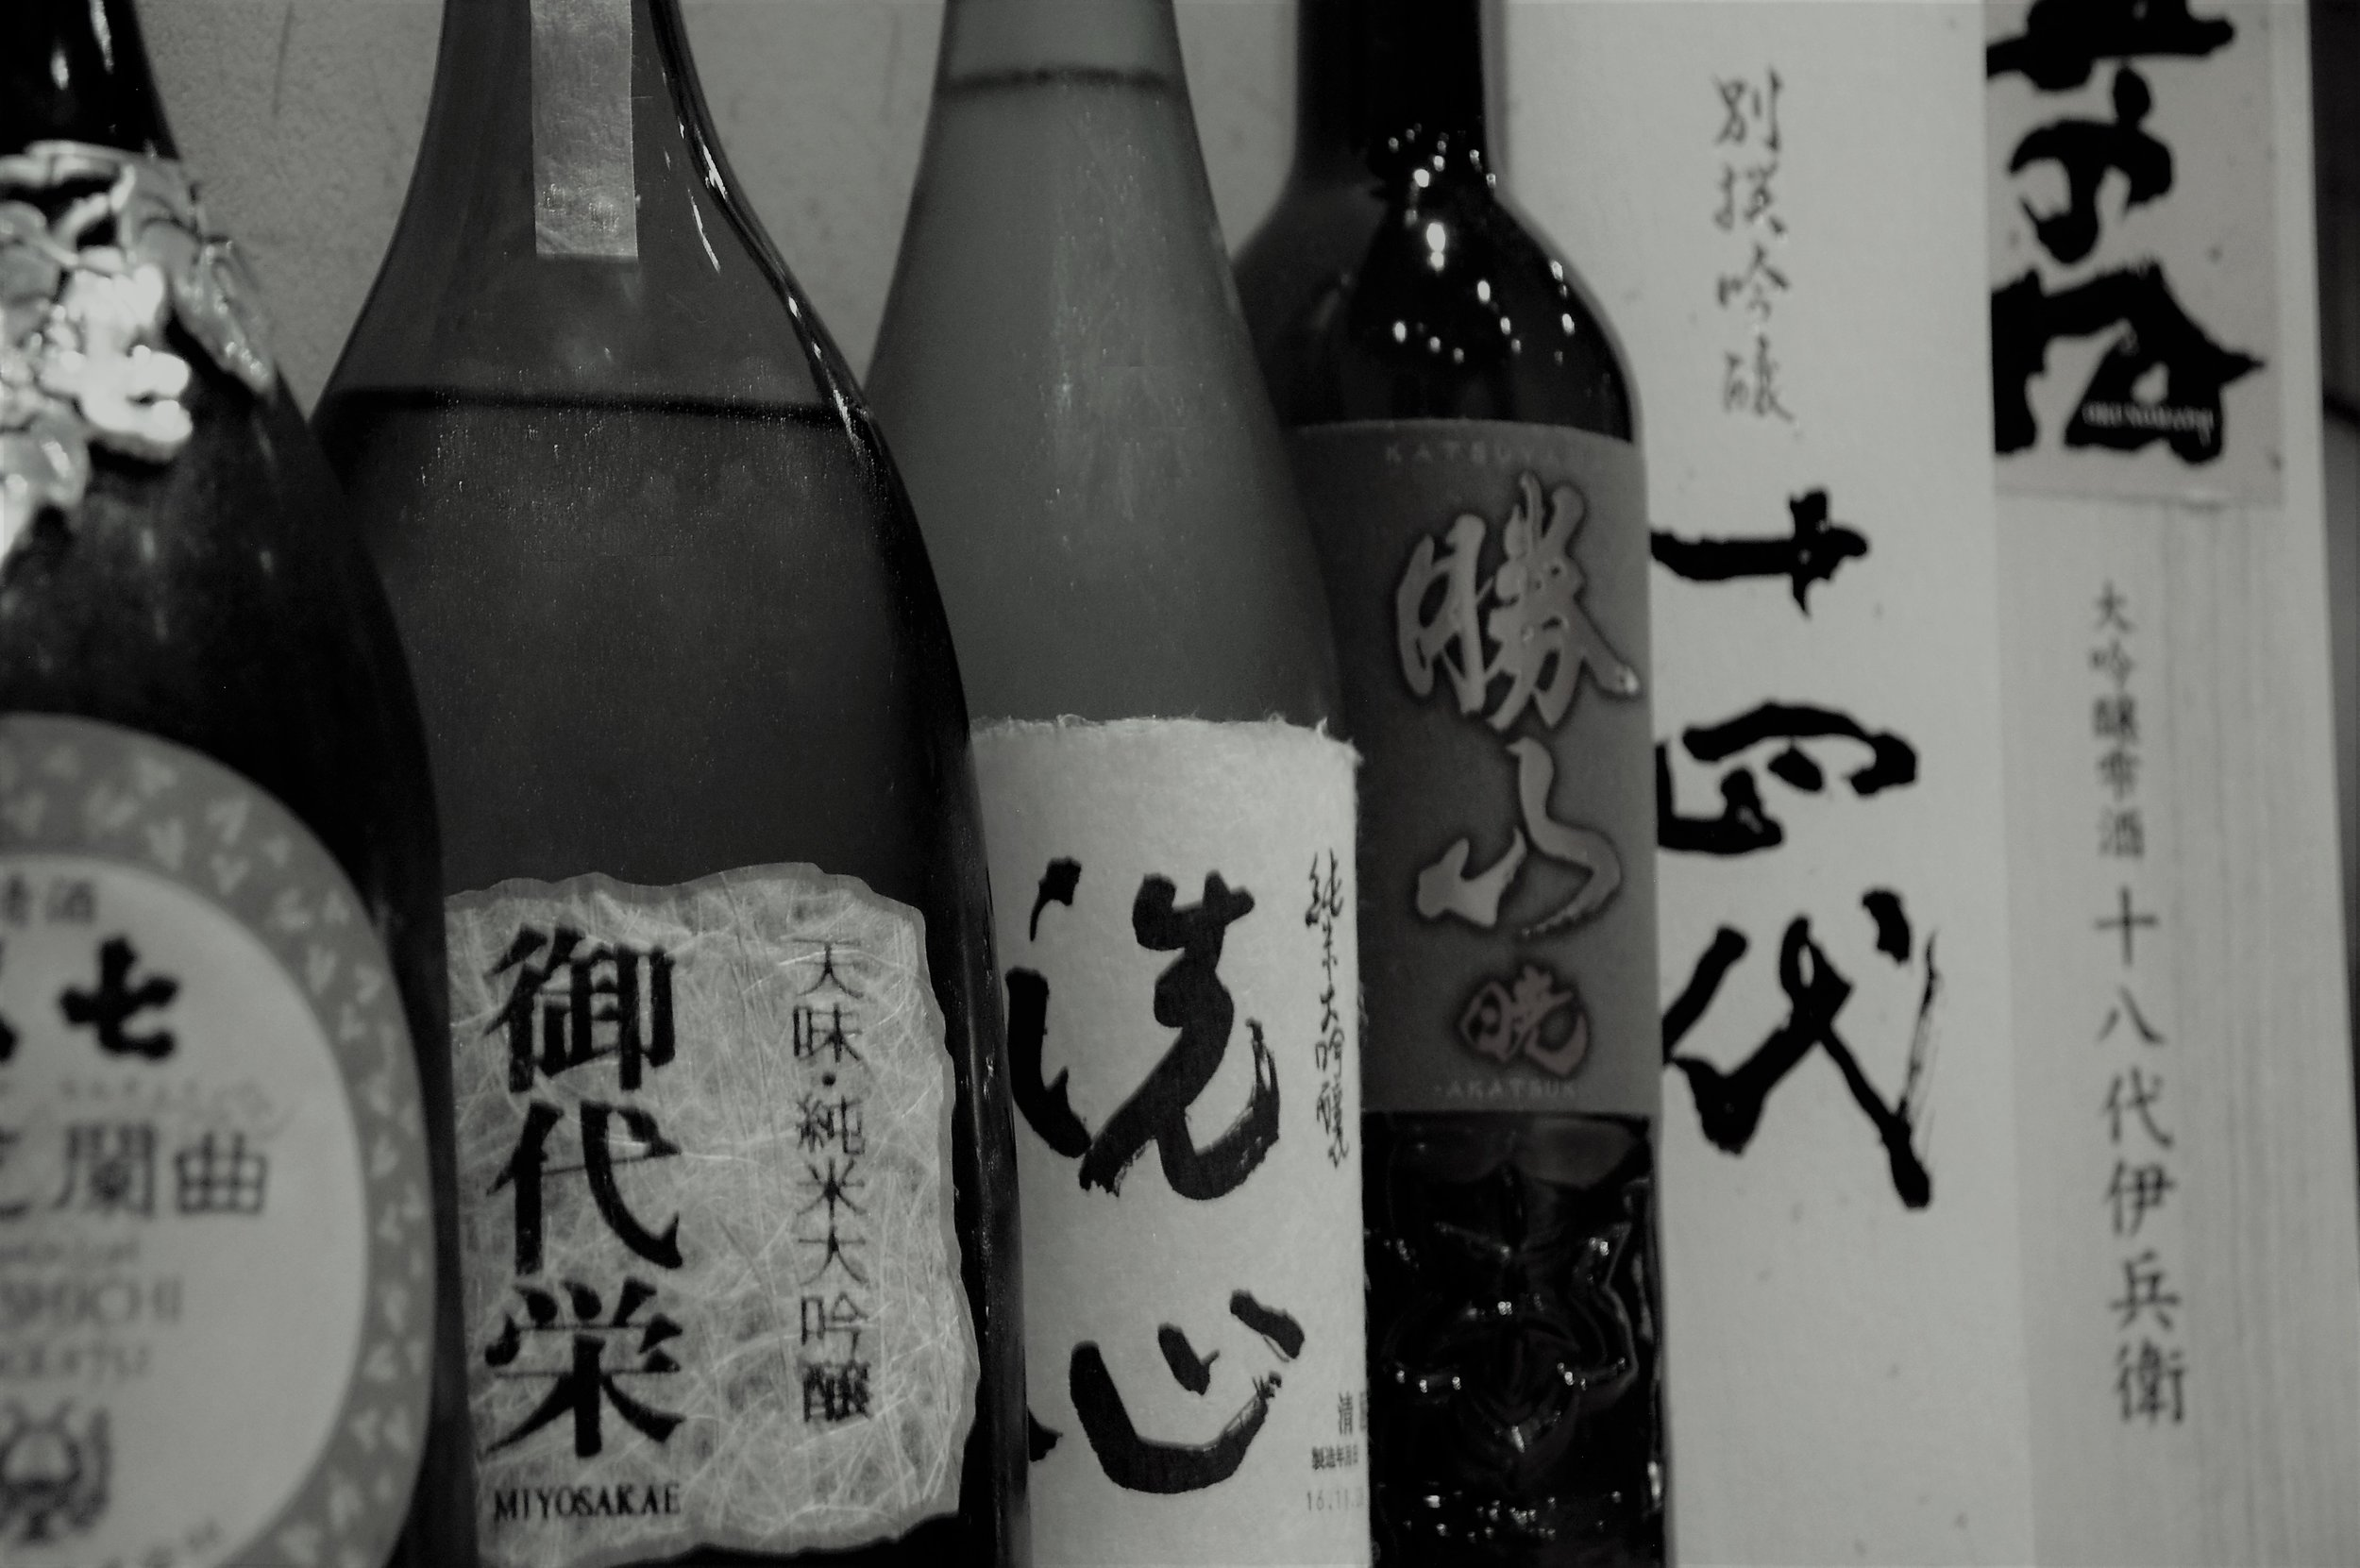 Premium sake 1 vanilla.jpg